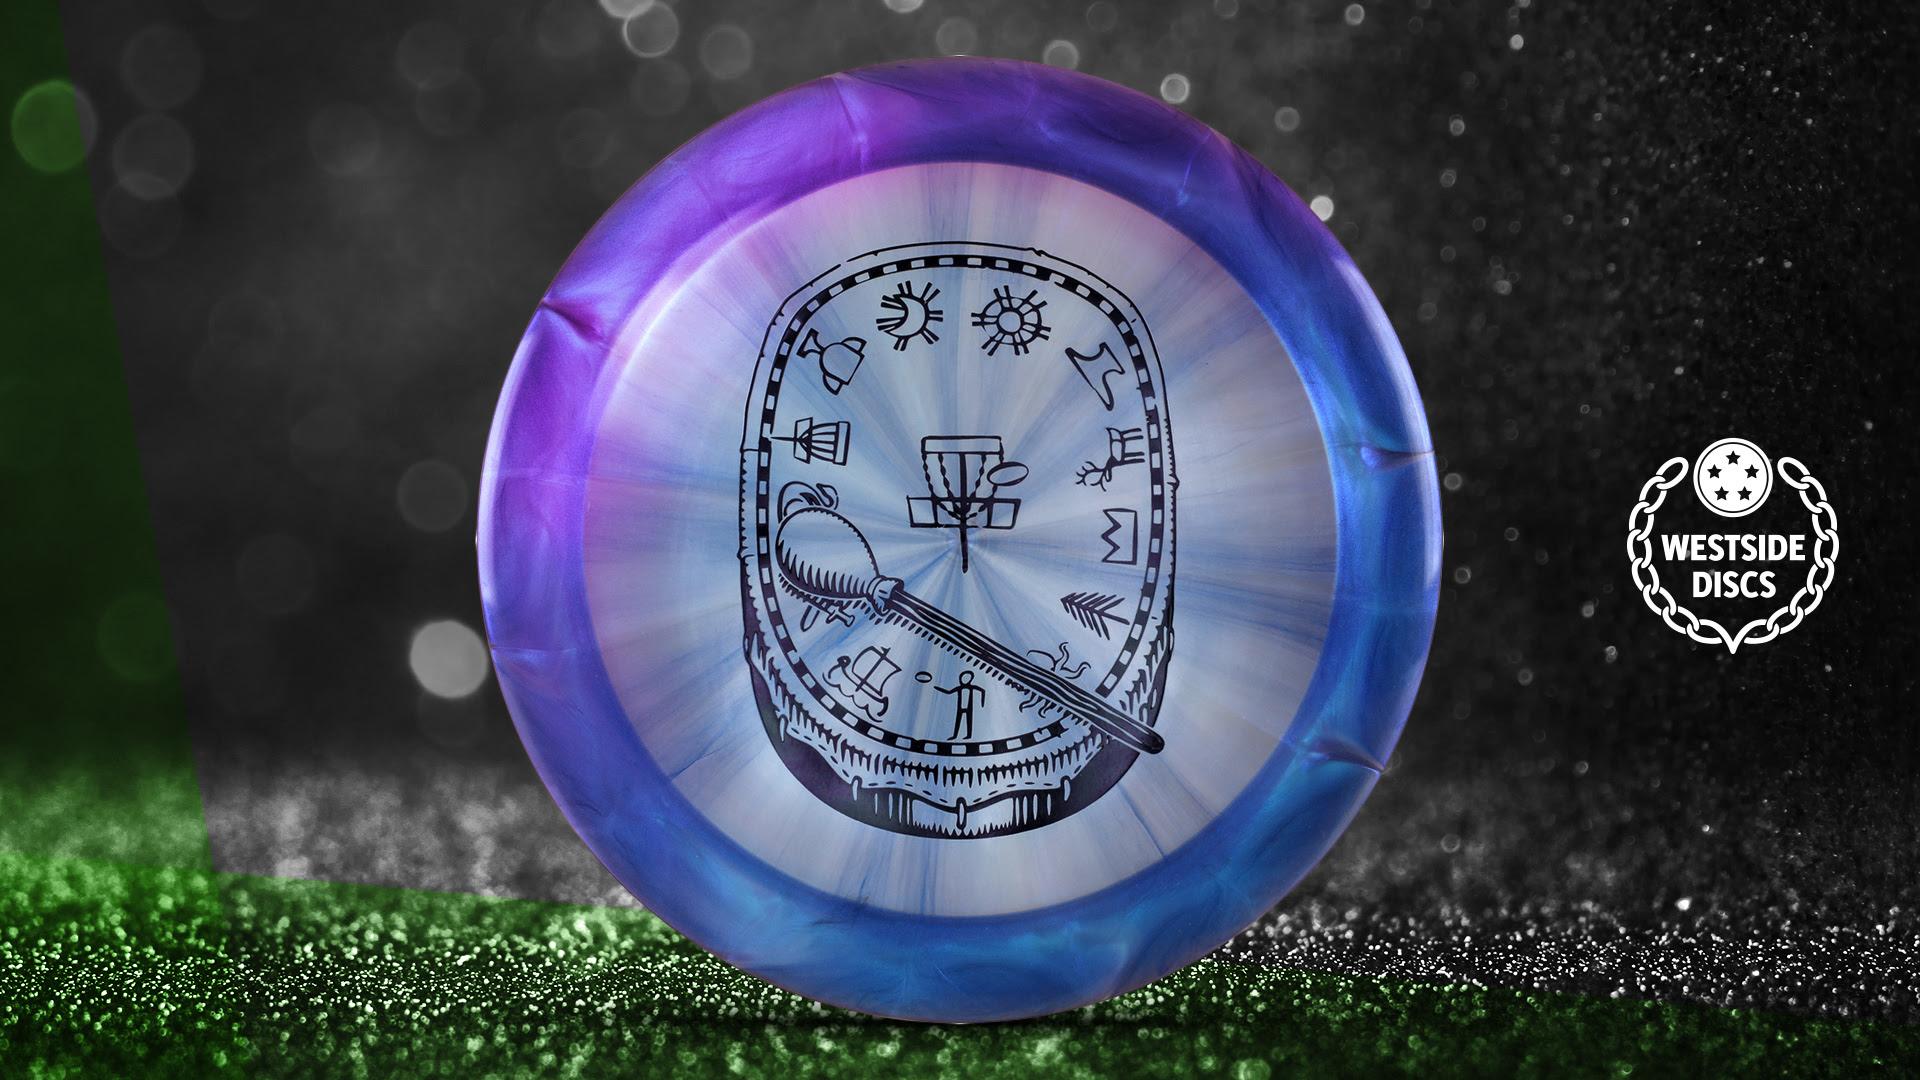 Westside Discs VIP-X Chameleon Destiny